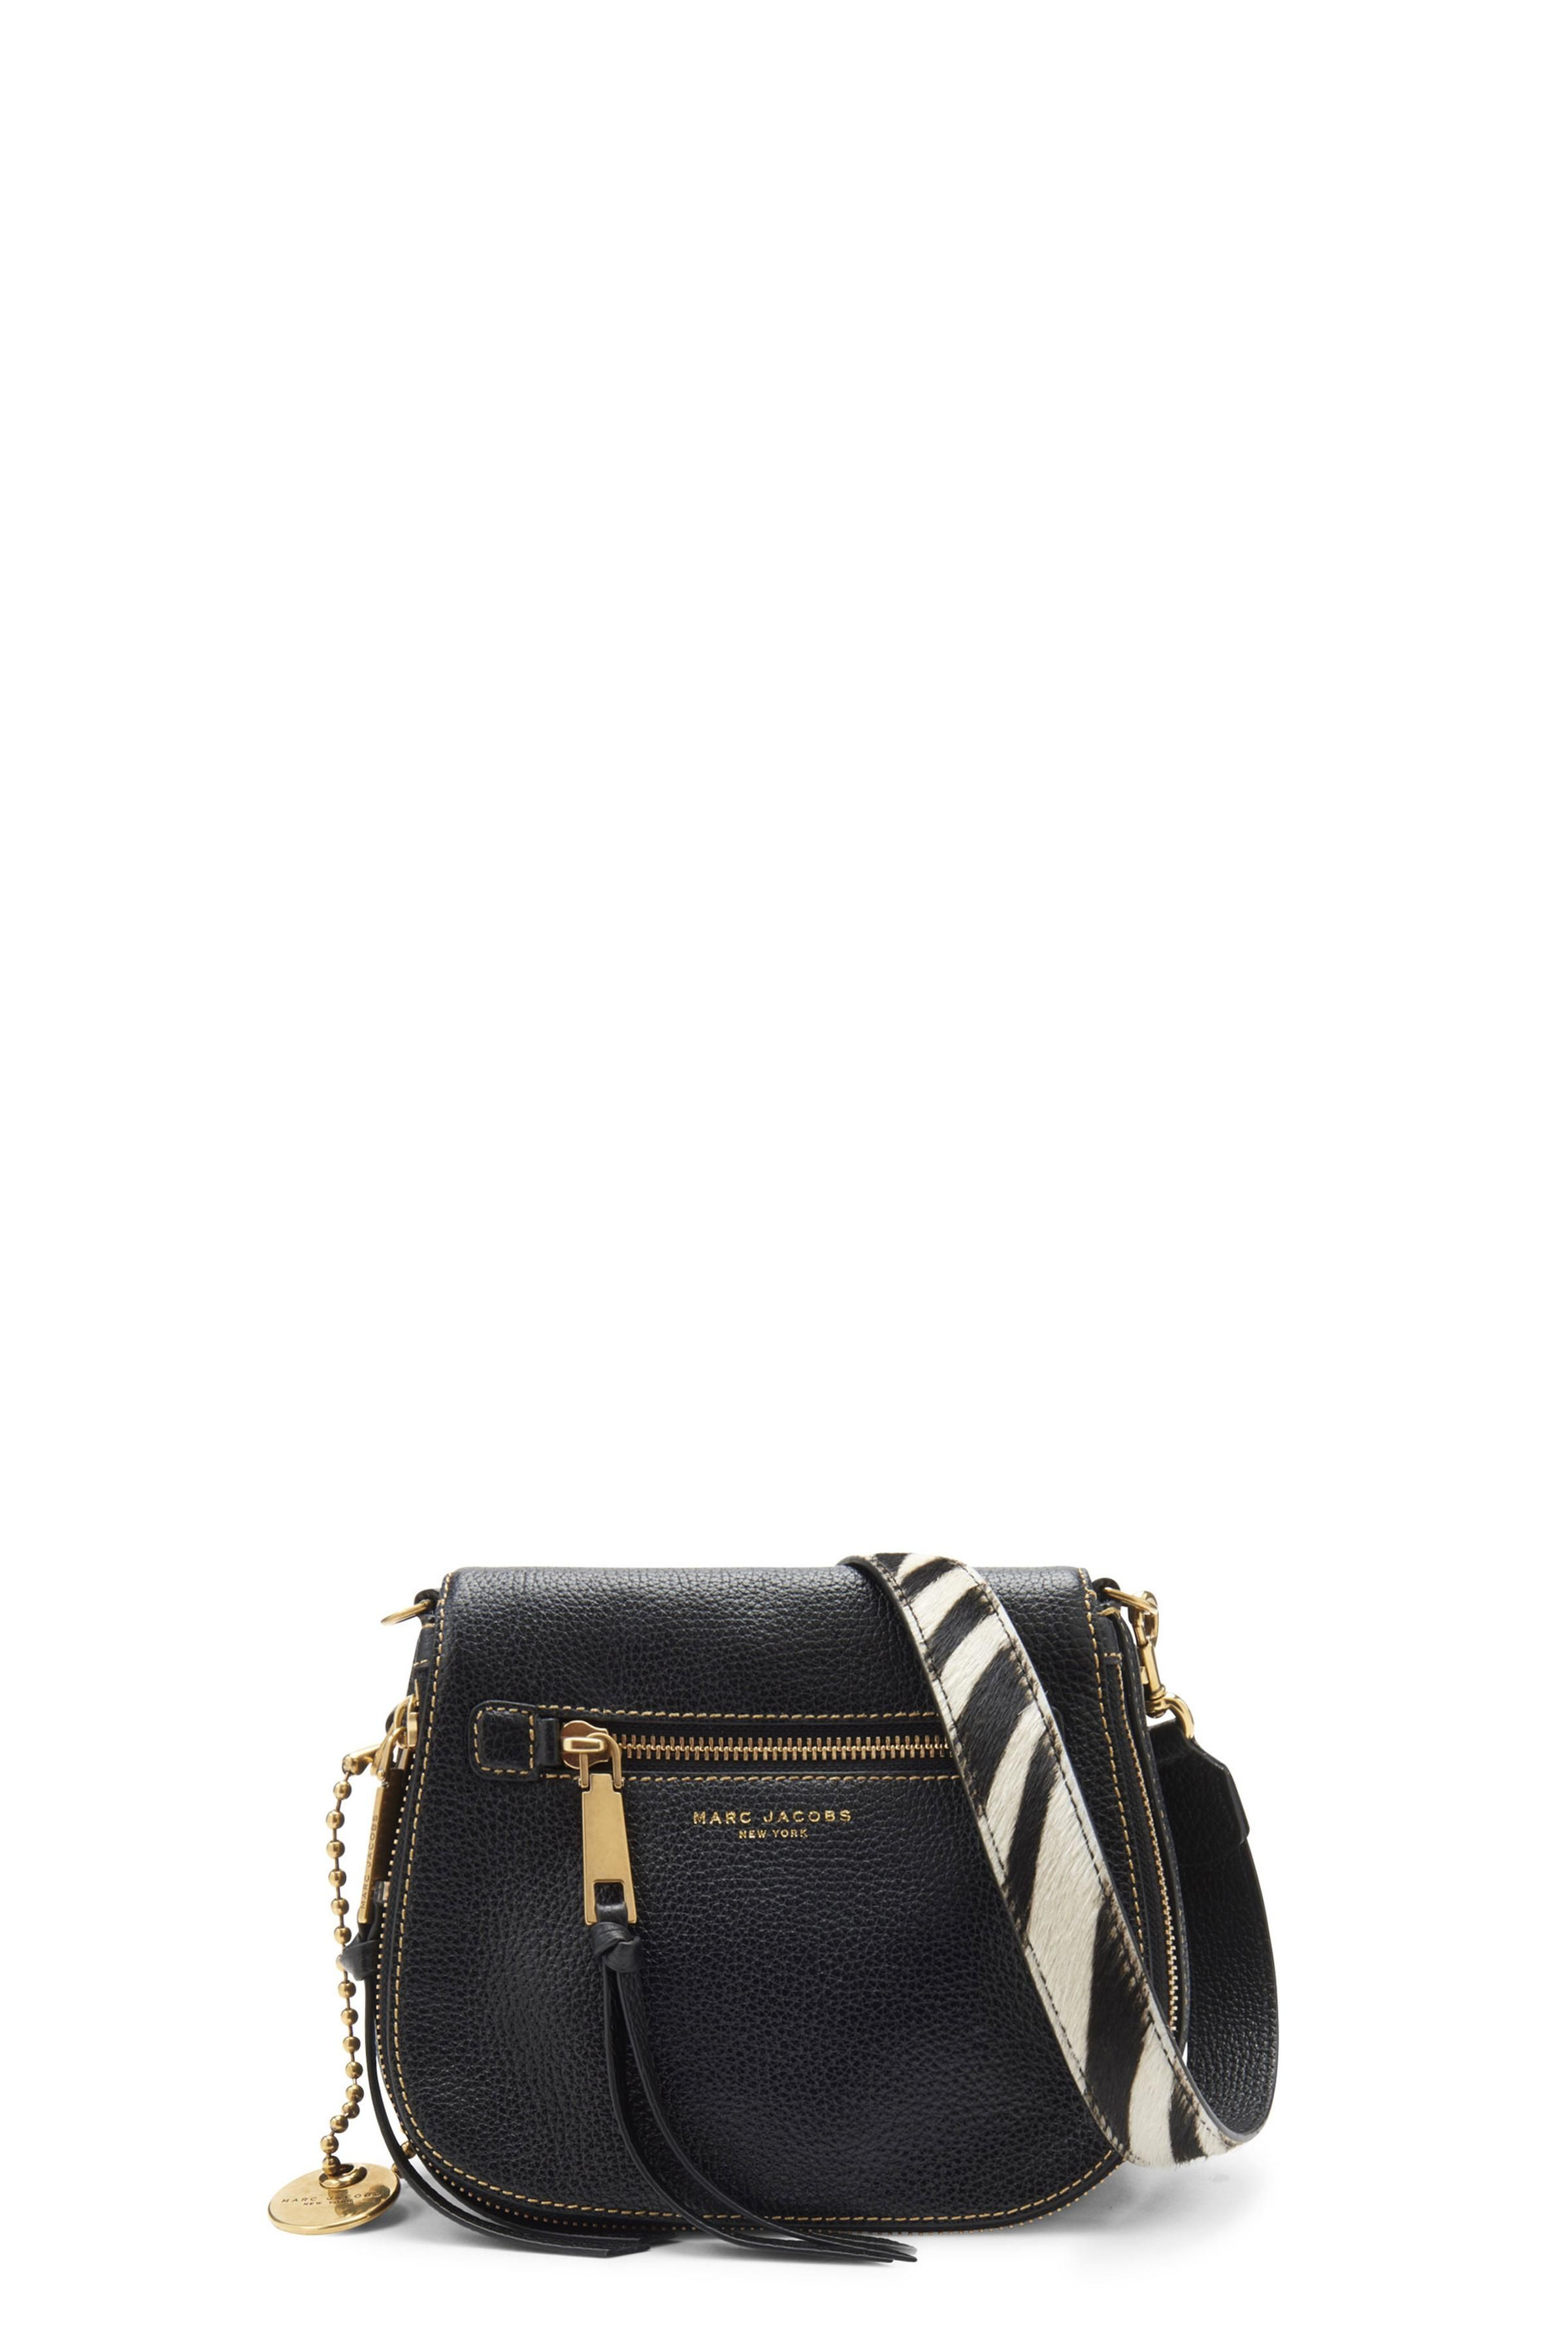 323894ccd8 Marc Jacobs Bag, Saddle Bags, Clutch Purse, Purses And Handbags, Shoulder  Strap